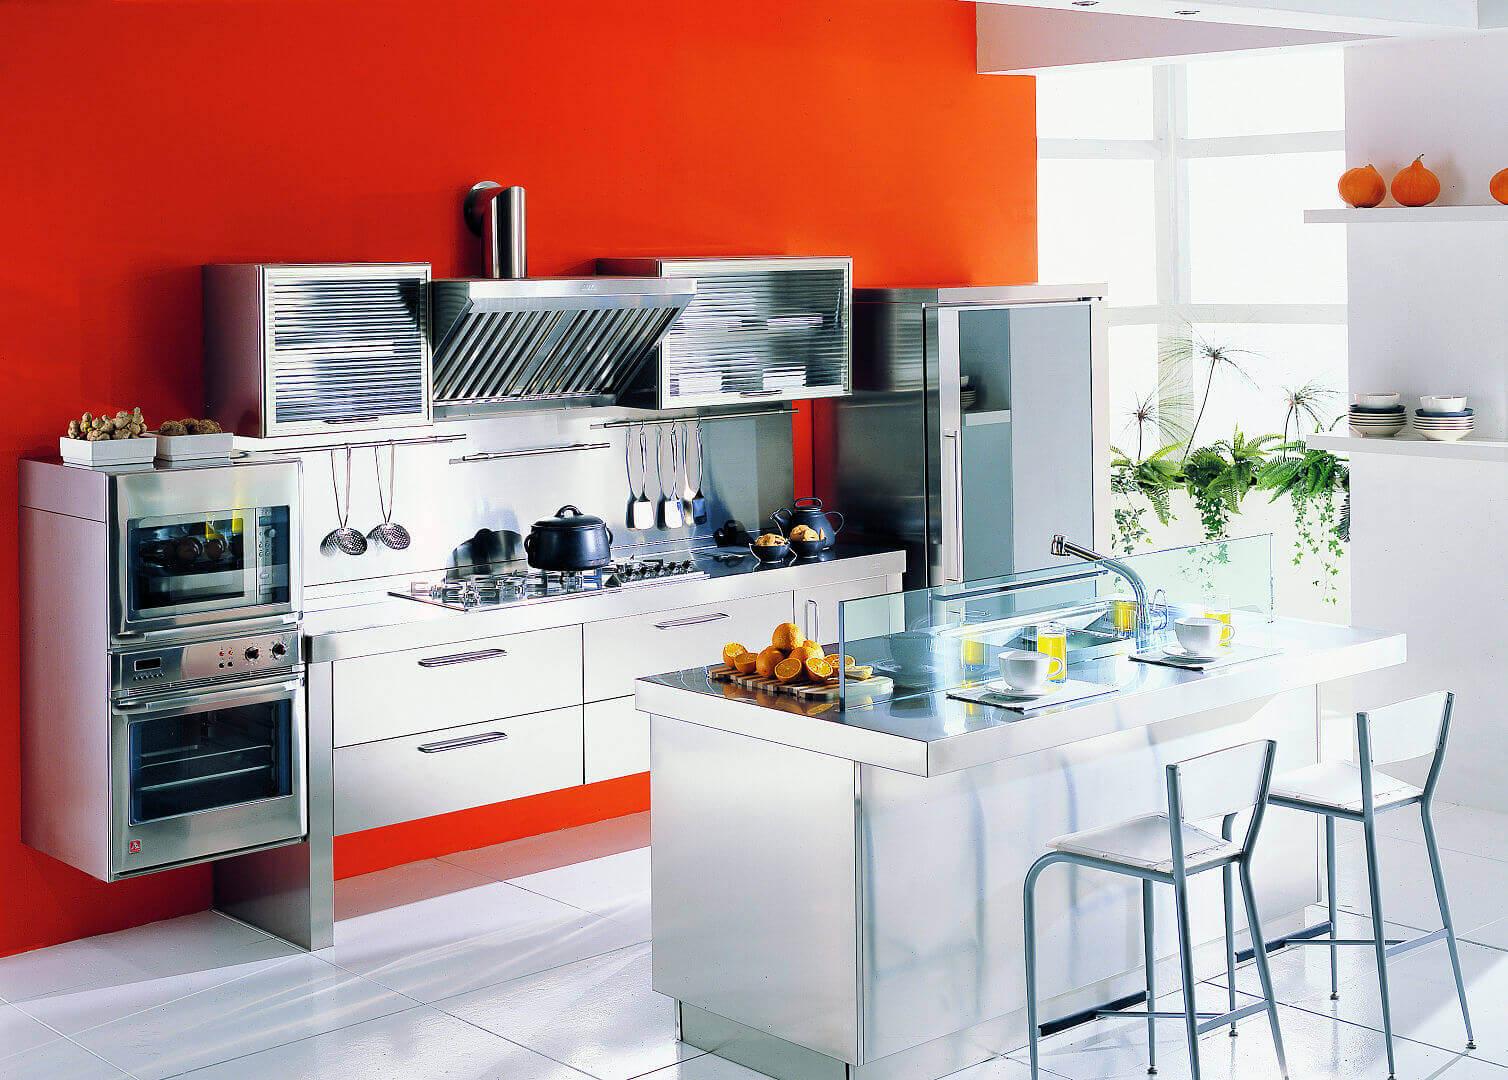 Arca Cucine Italia - Cucina Domestica in Acciaio Inox - Spring